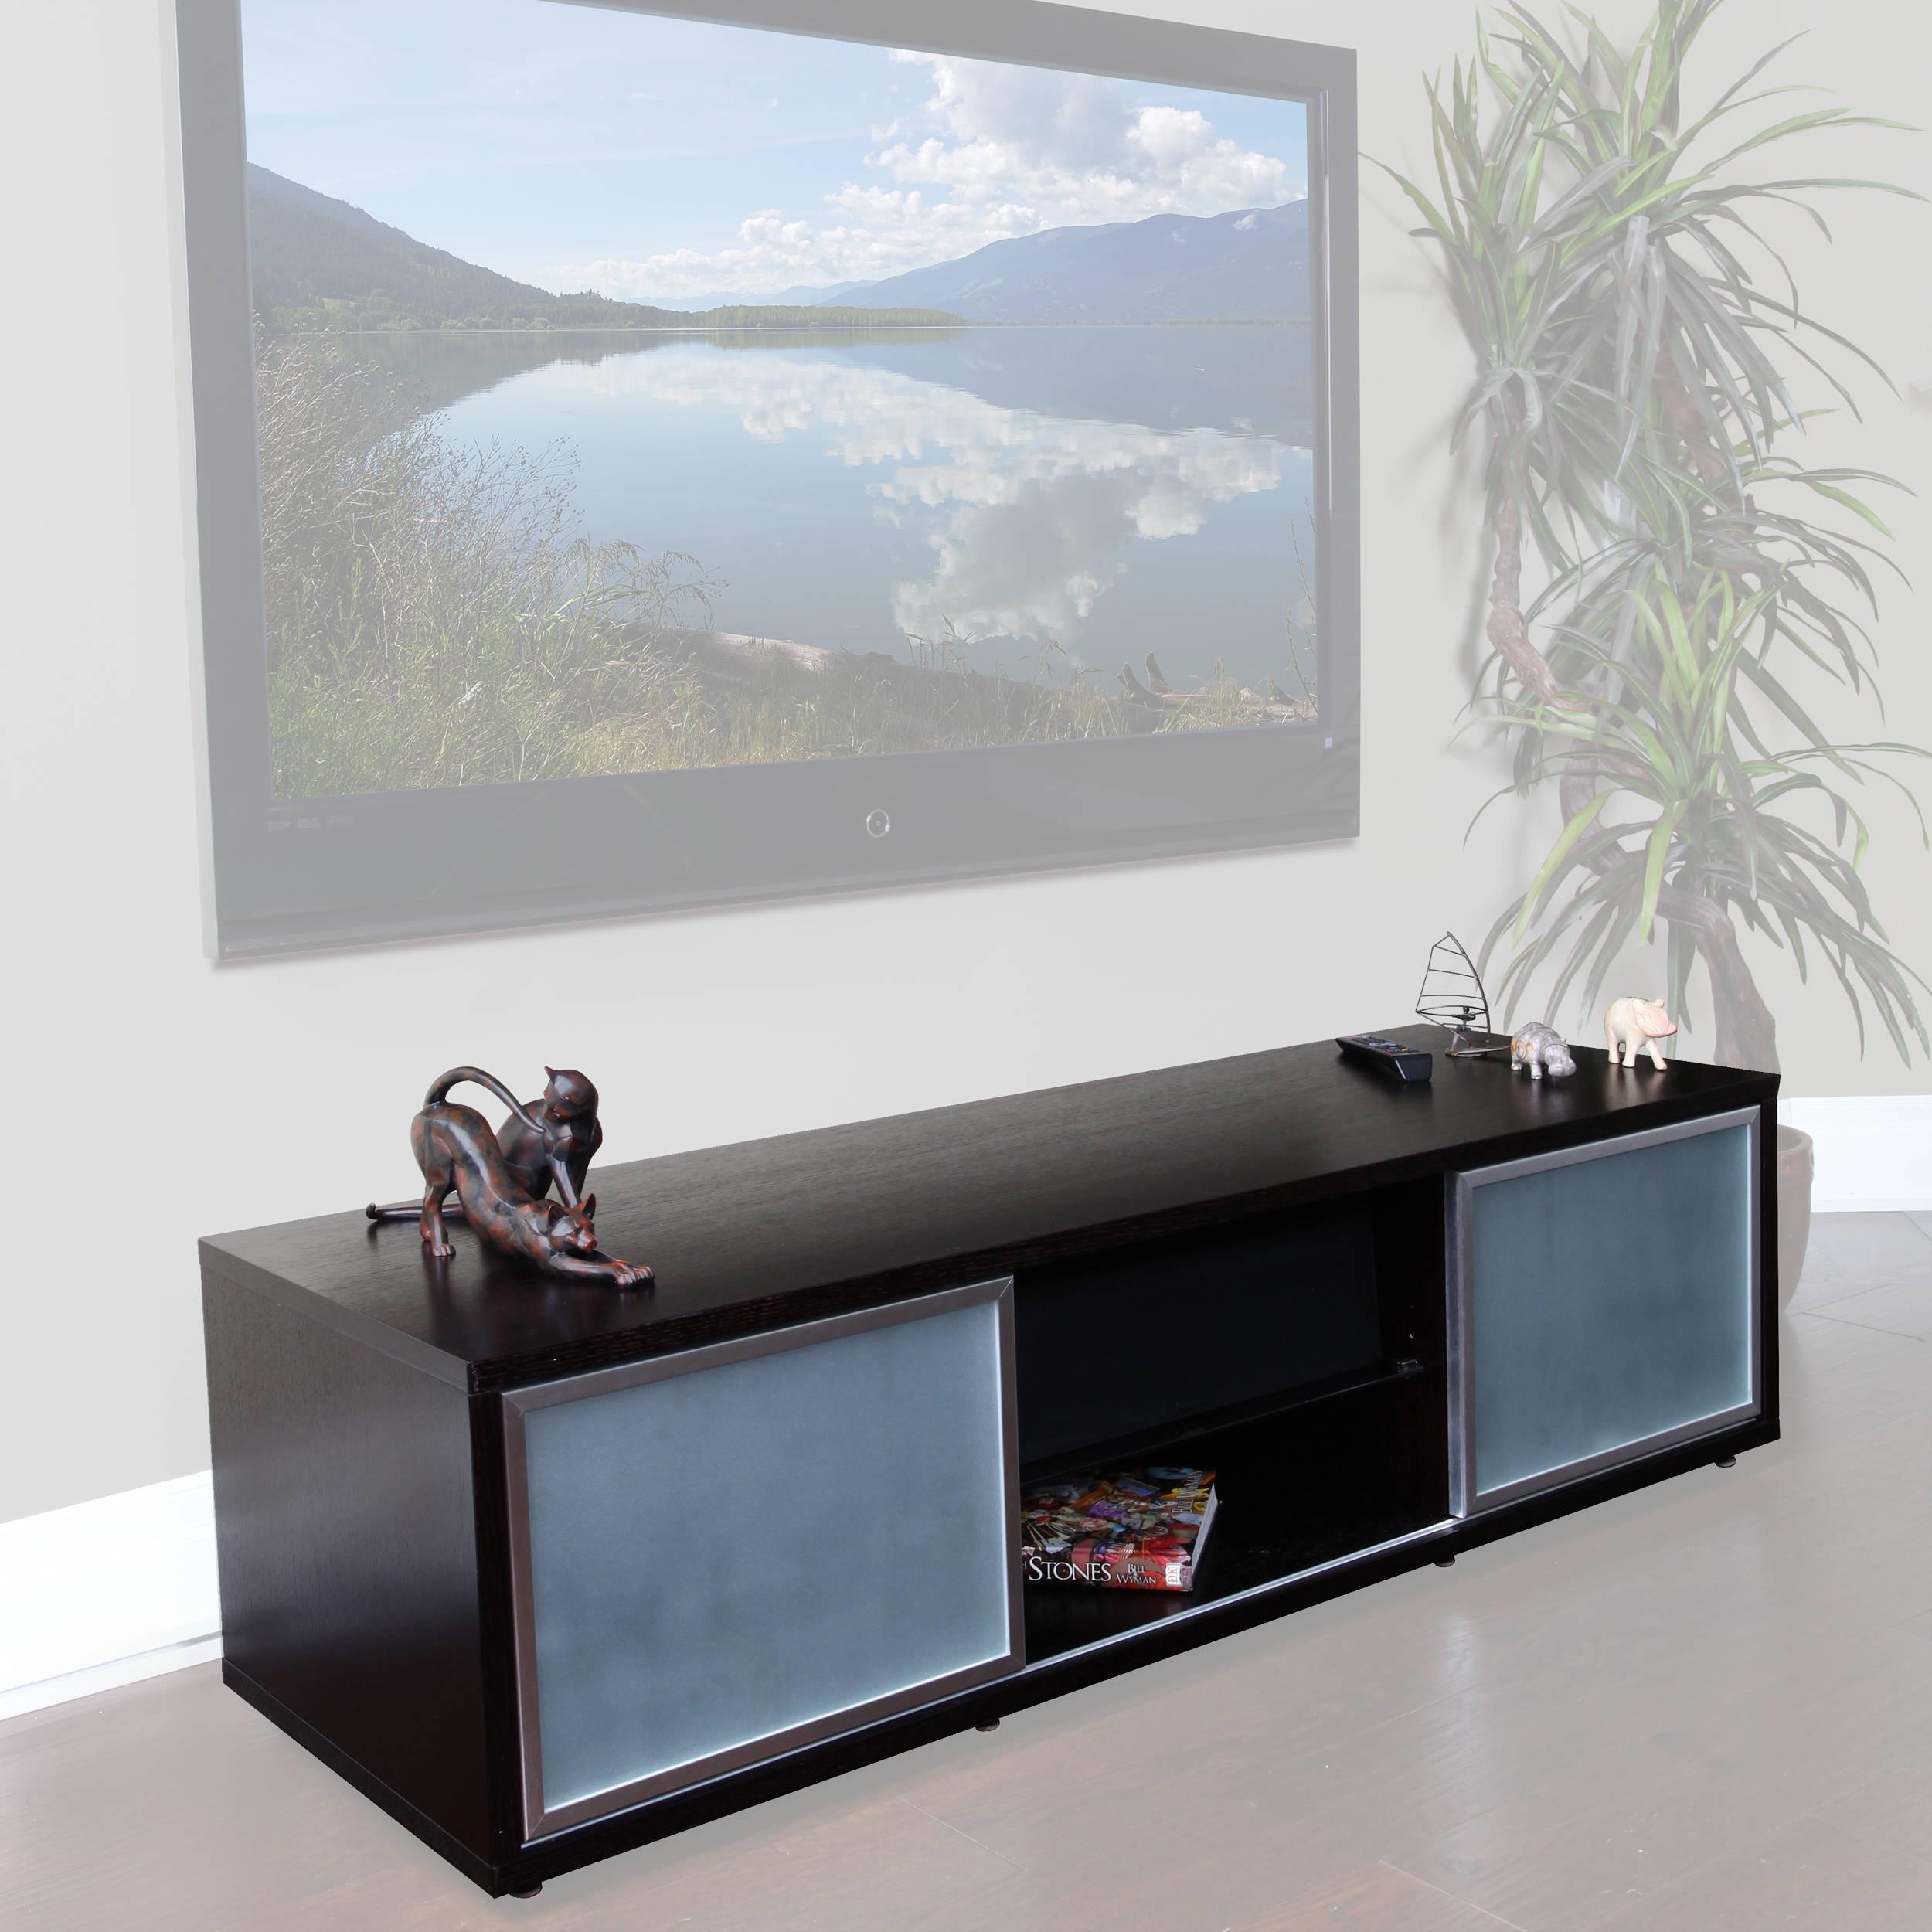 Plateau Sr V65 Wood And Glass 65 Tv Stand Sr V 65 Eb S